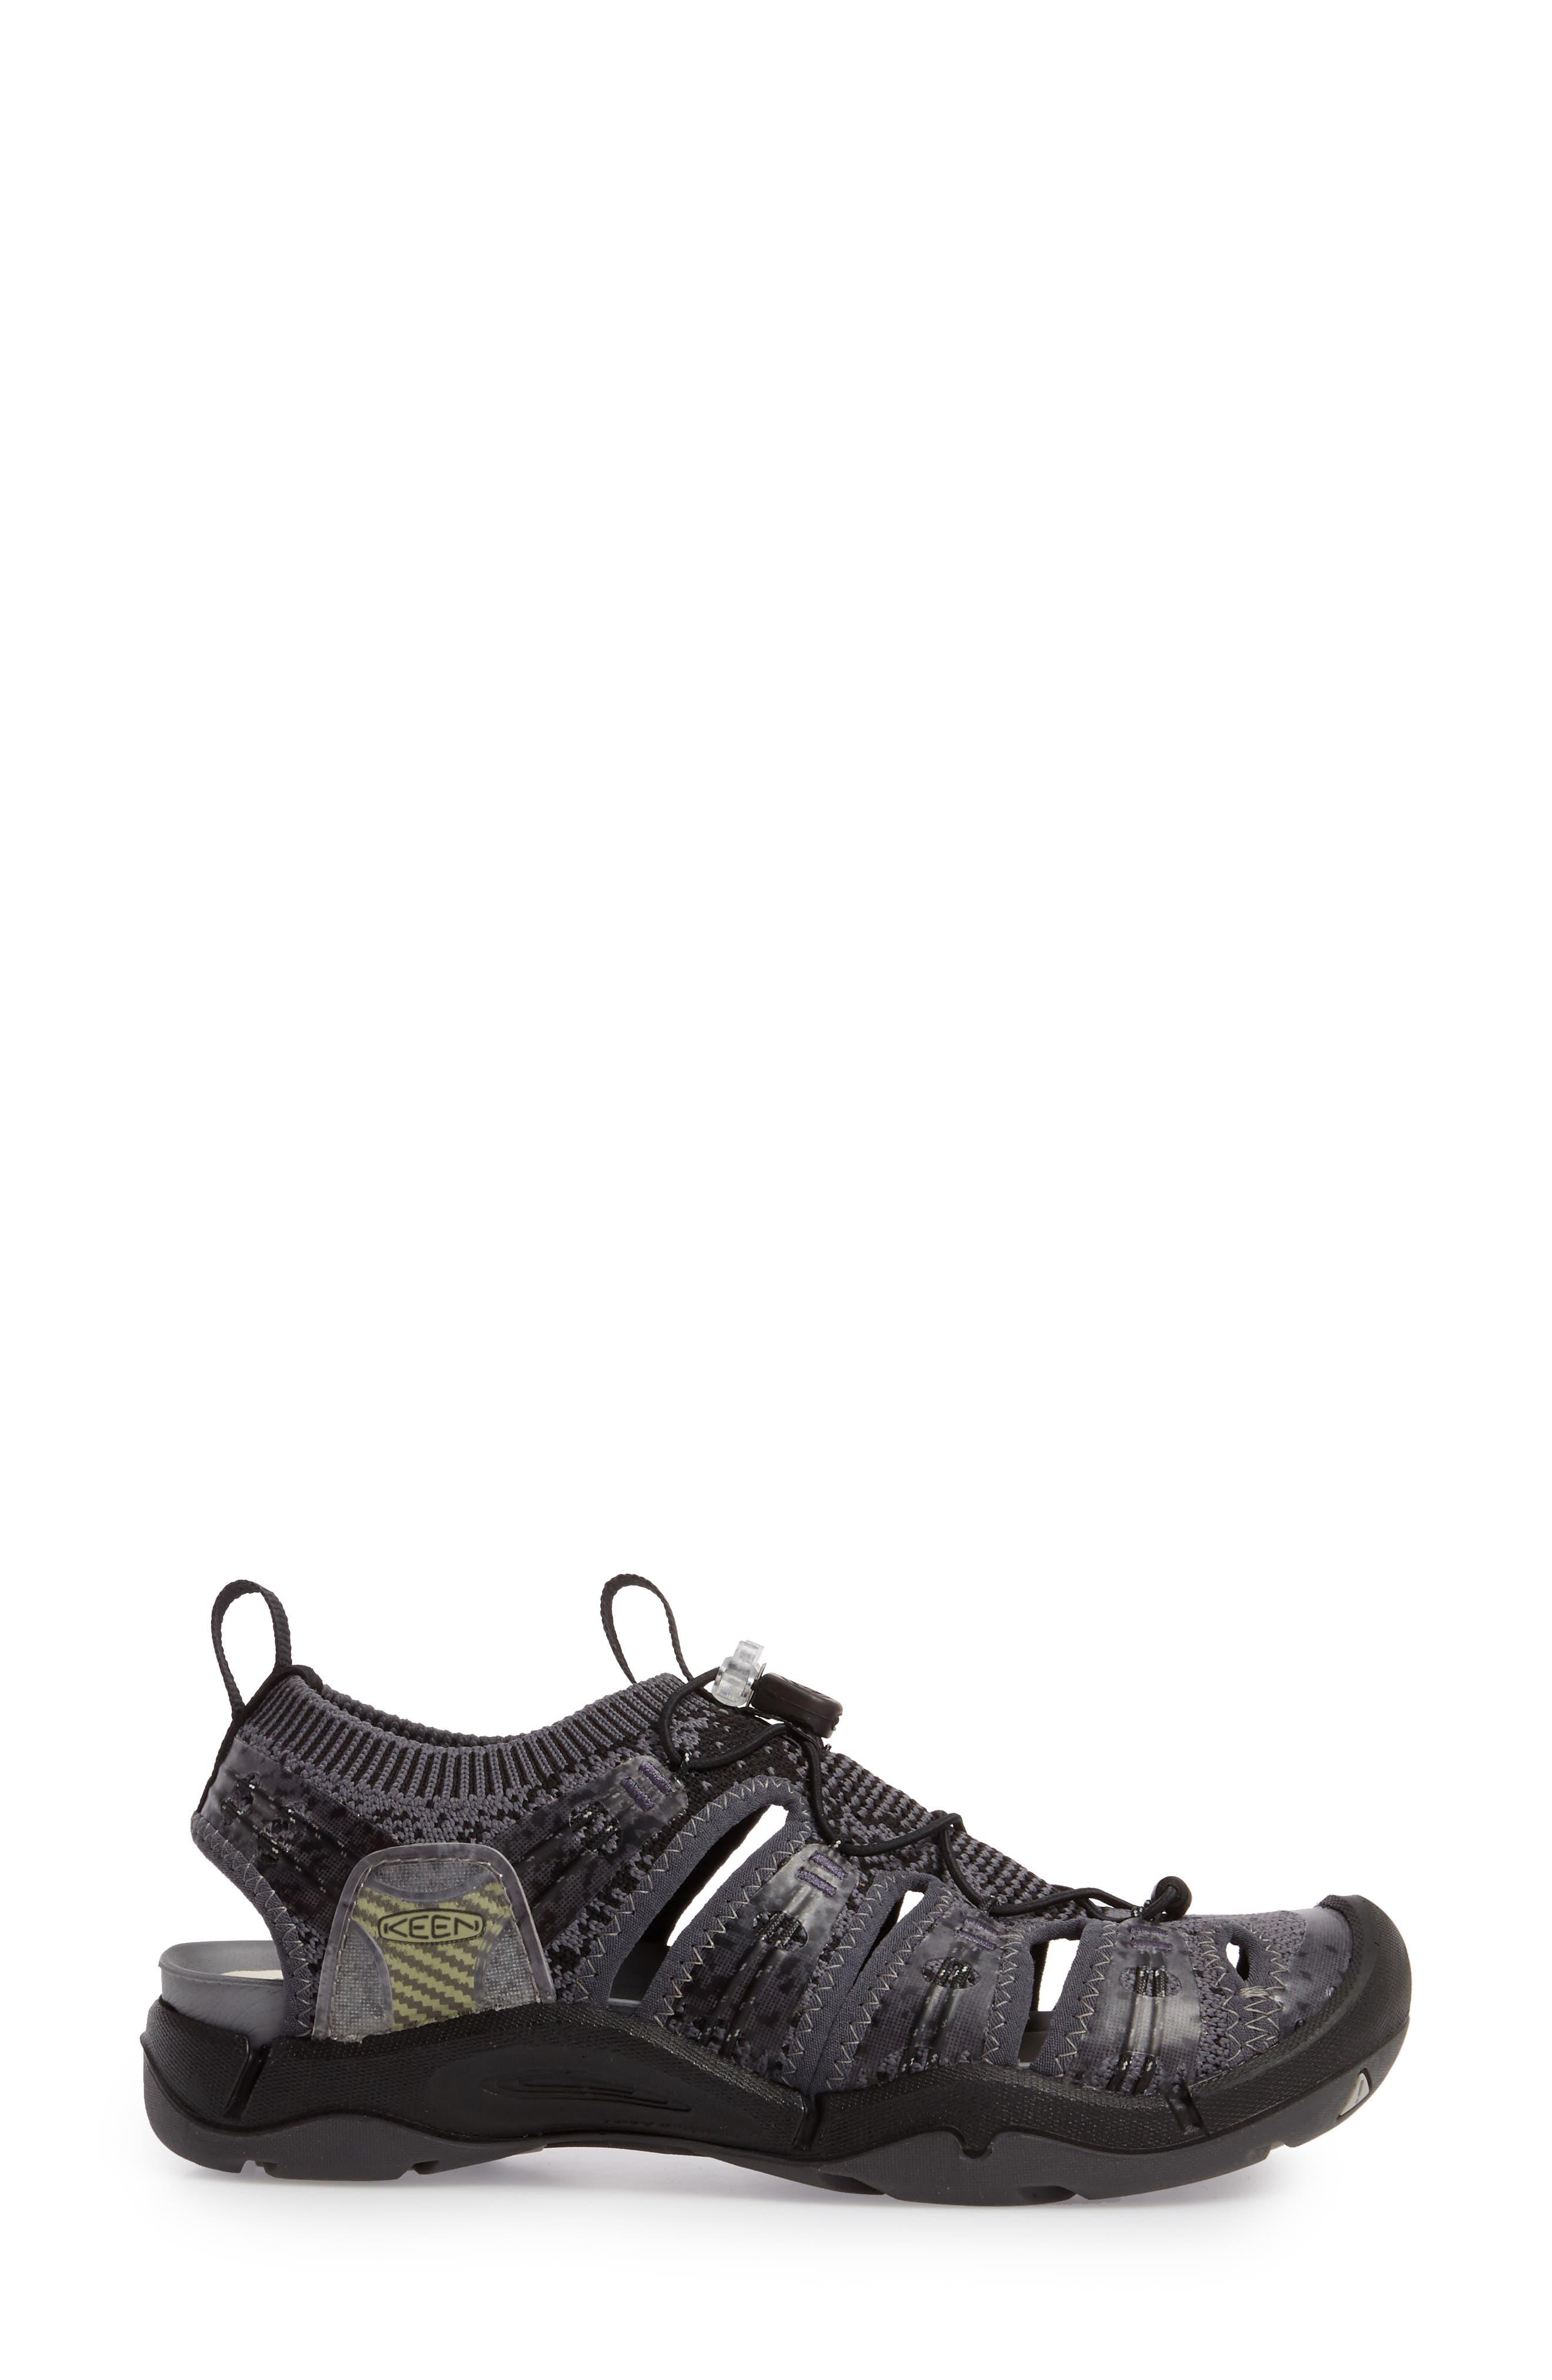 KEEN, EVOFIT One Sandal, Alternate thumbnail 3, color, HEATHERED BLACK/ MAGNET